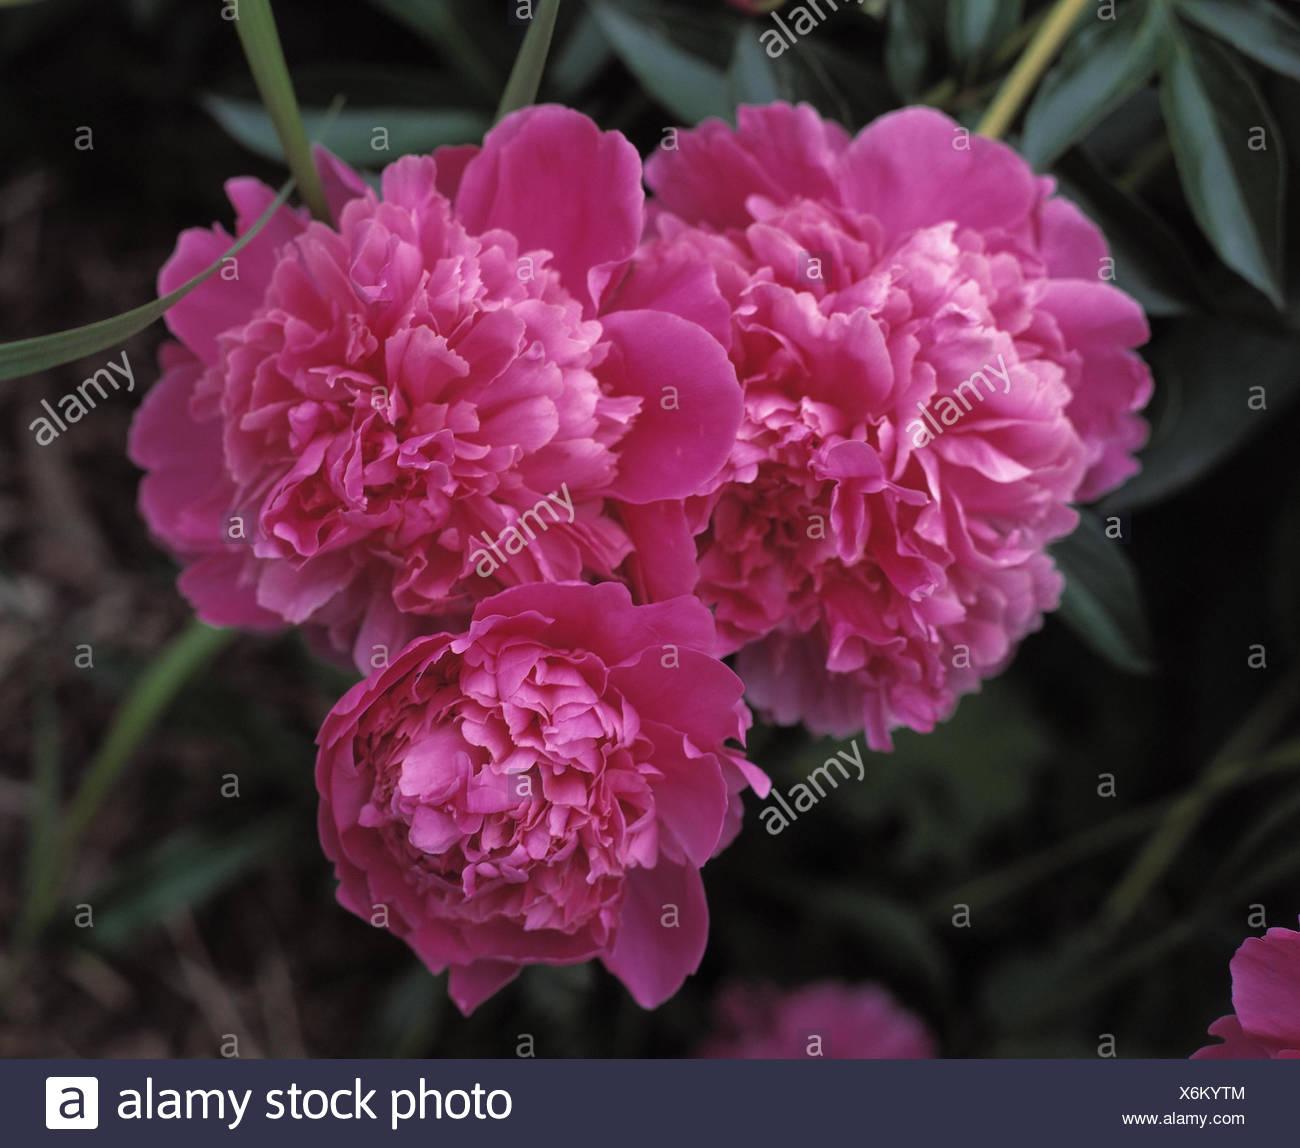 Pfingstrosen Paeonia Officinalis Pflanze Pflanzen Blume Blumen